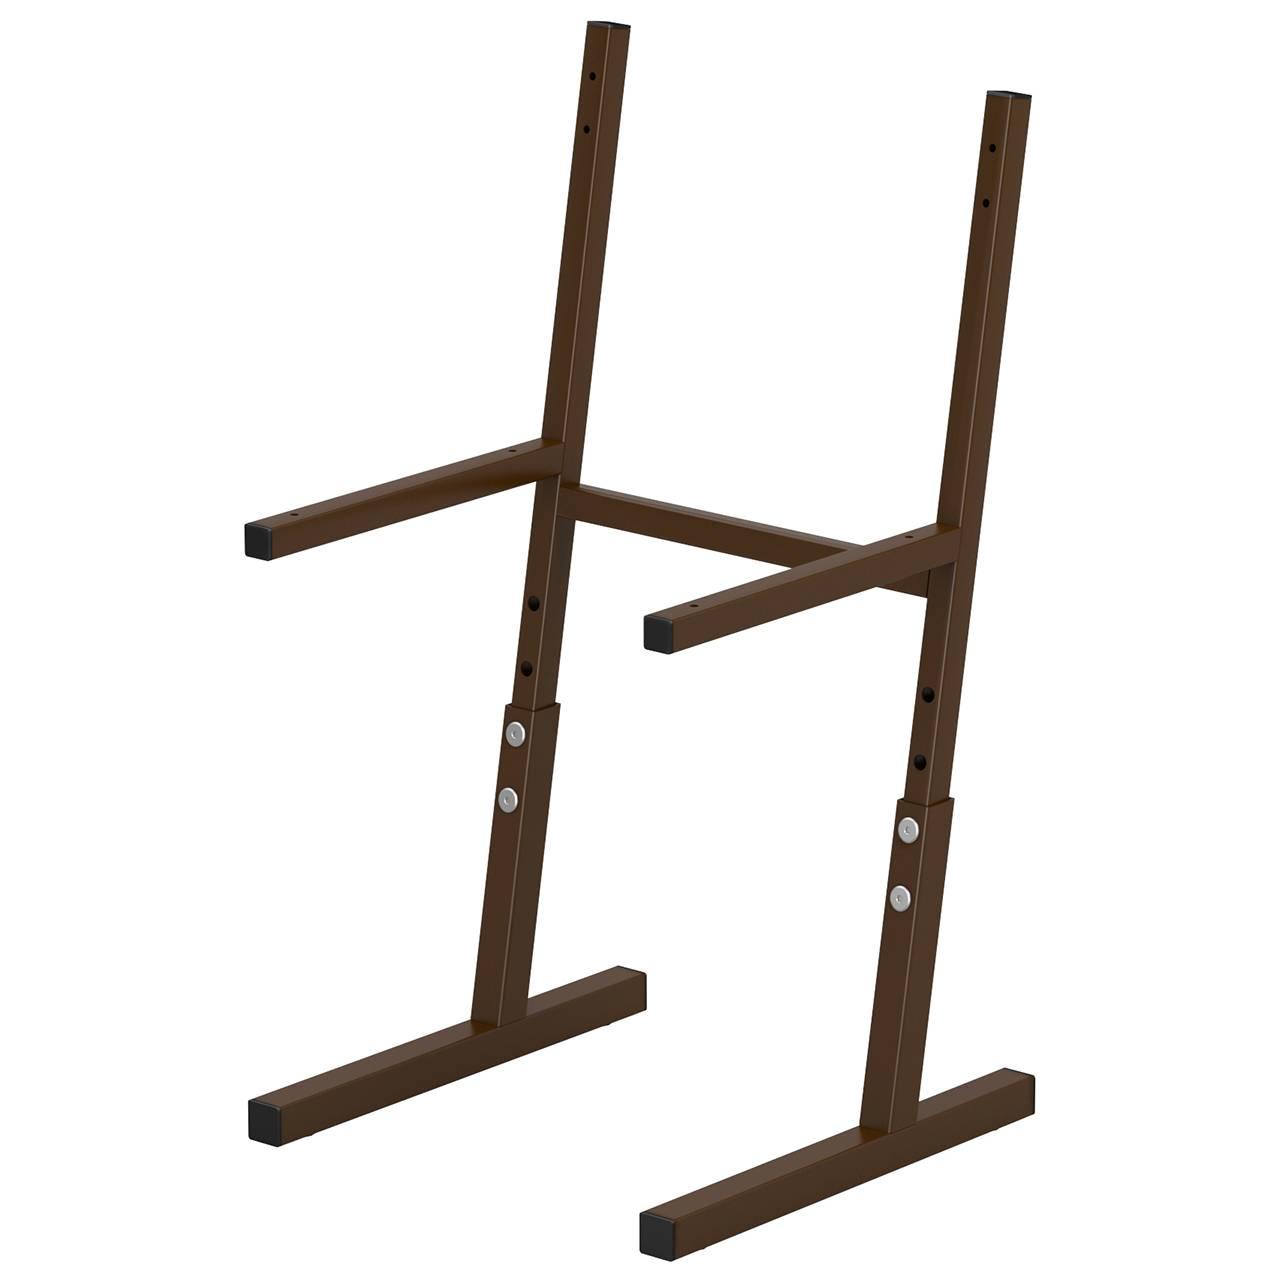 Металлокаркас стула ученического (гр. 3-5, 4-6) коричневый 3-5